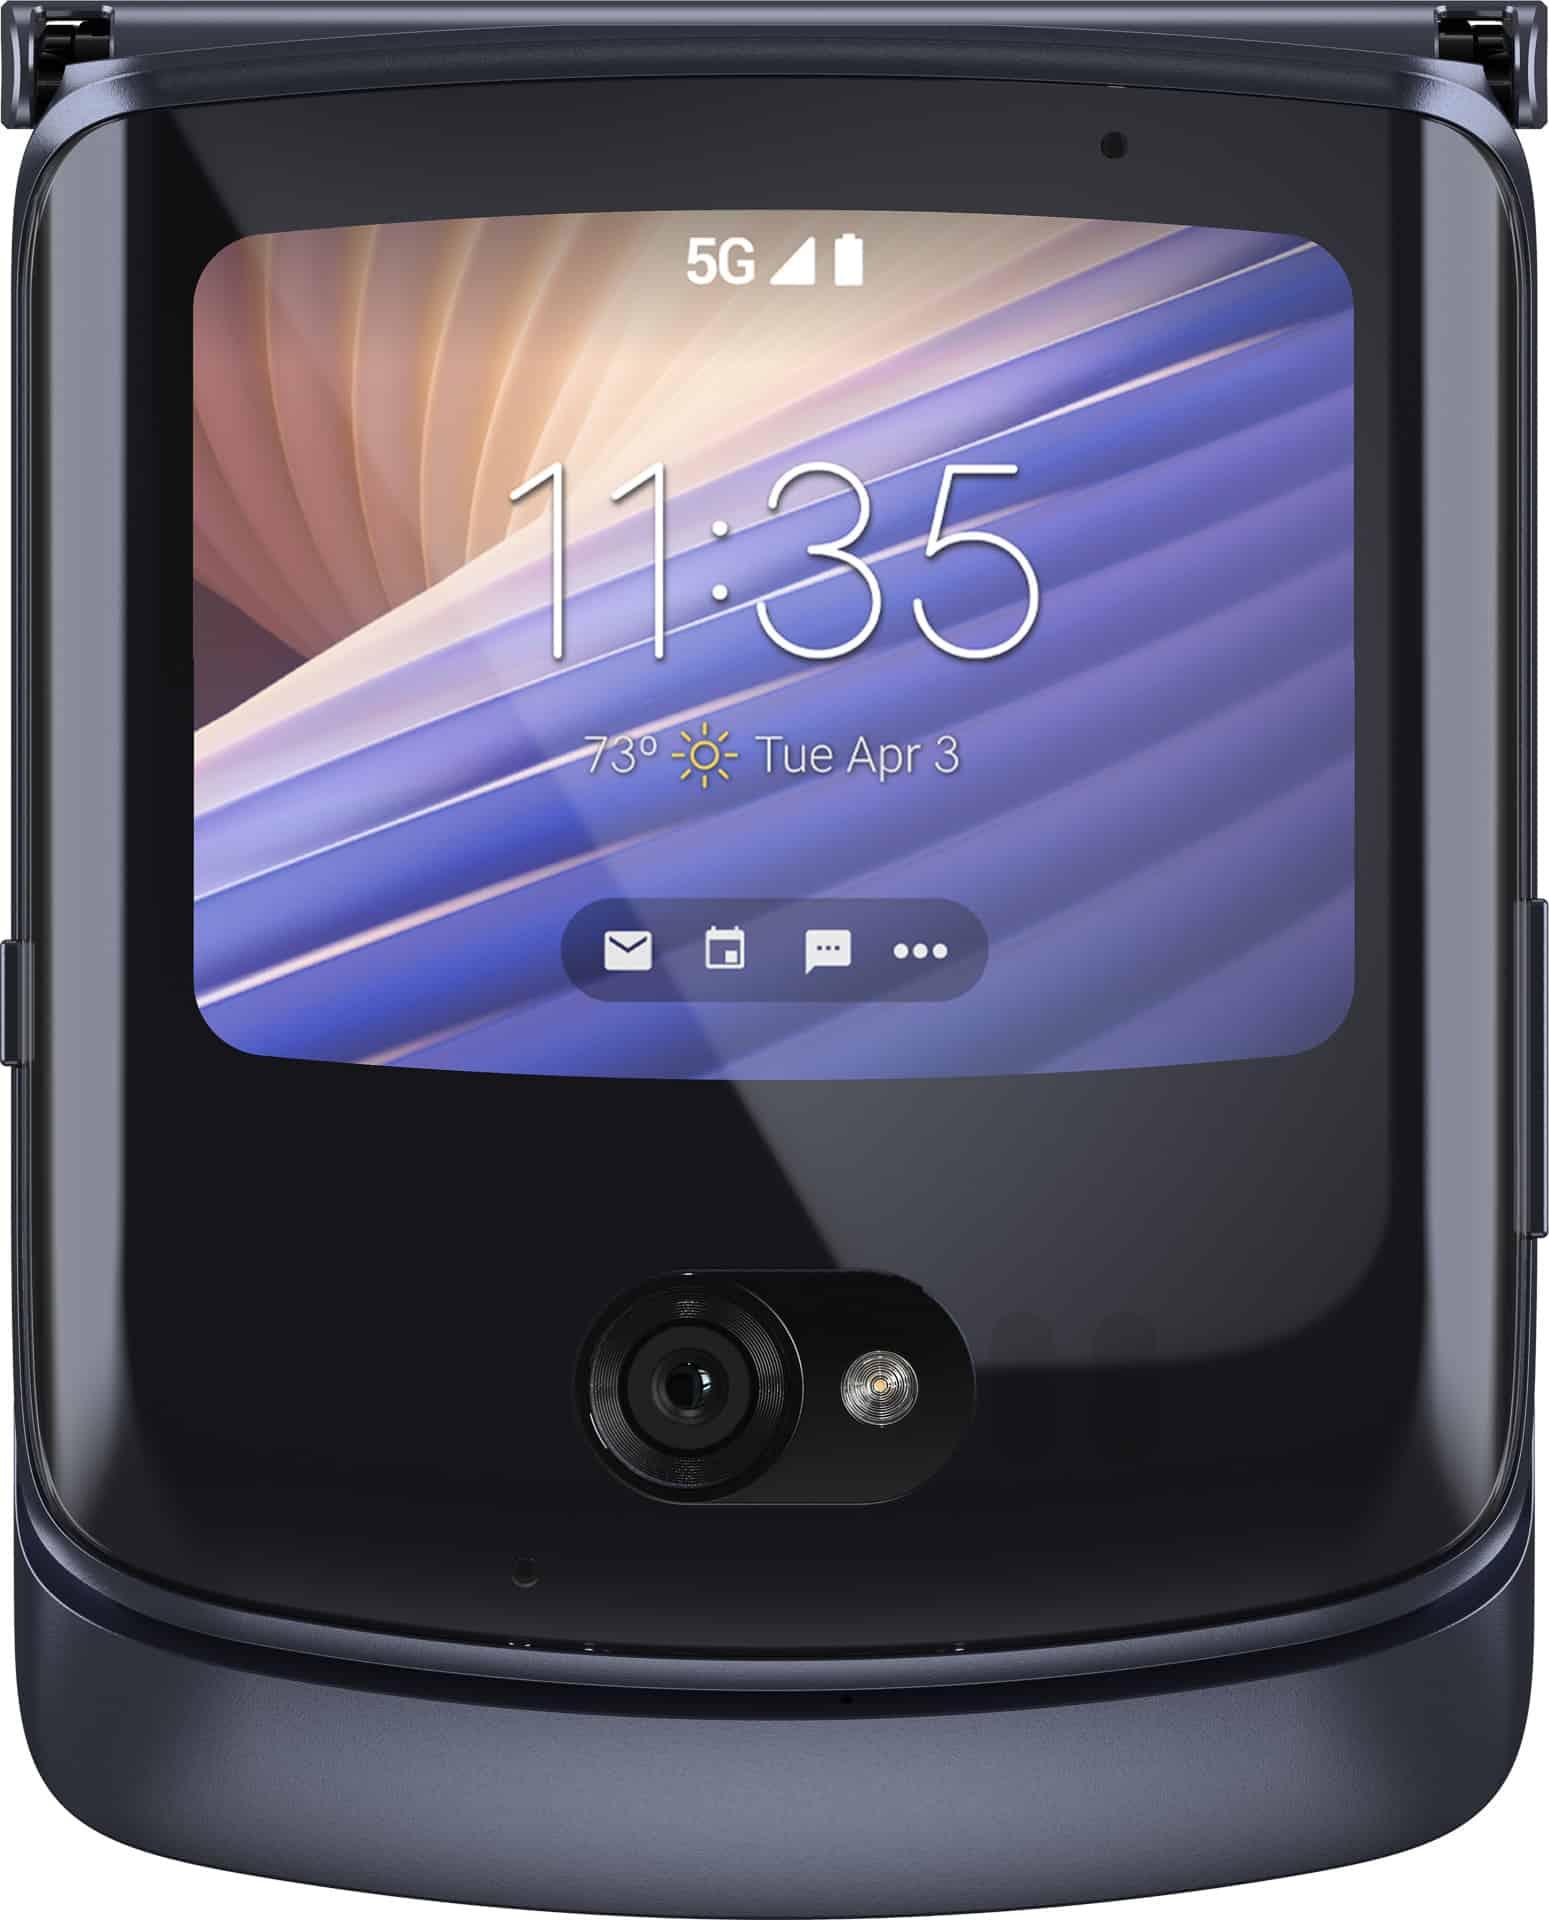 Motorola razr 5g AH 6